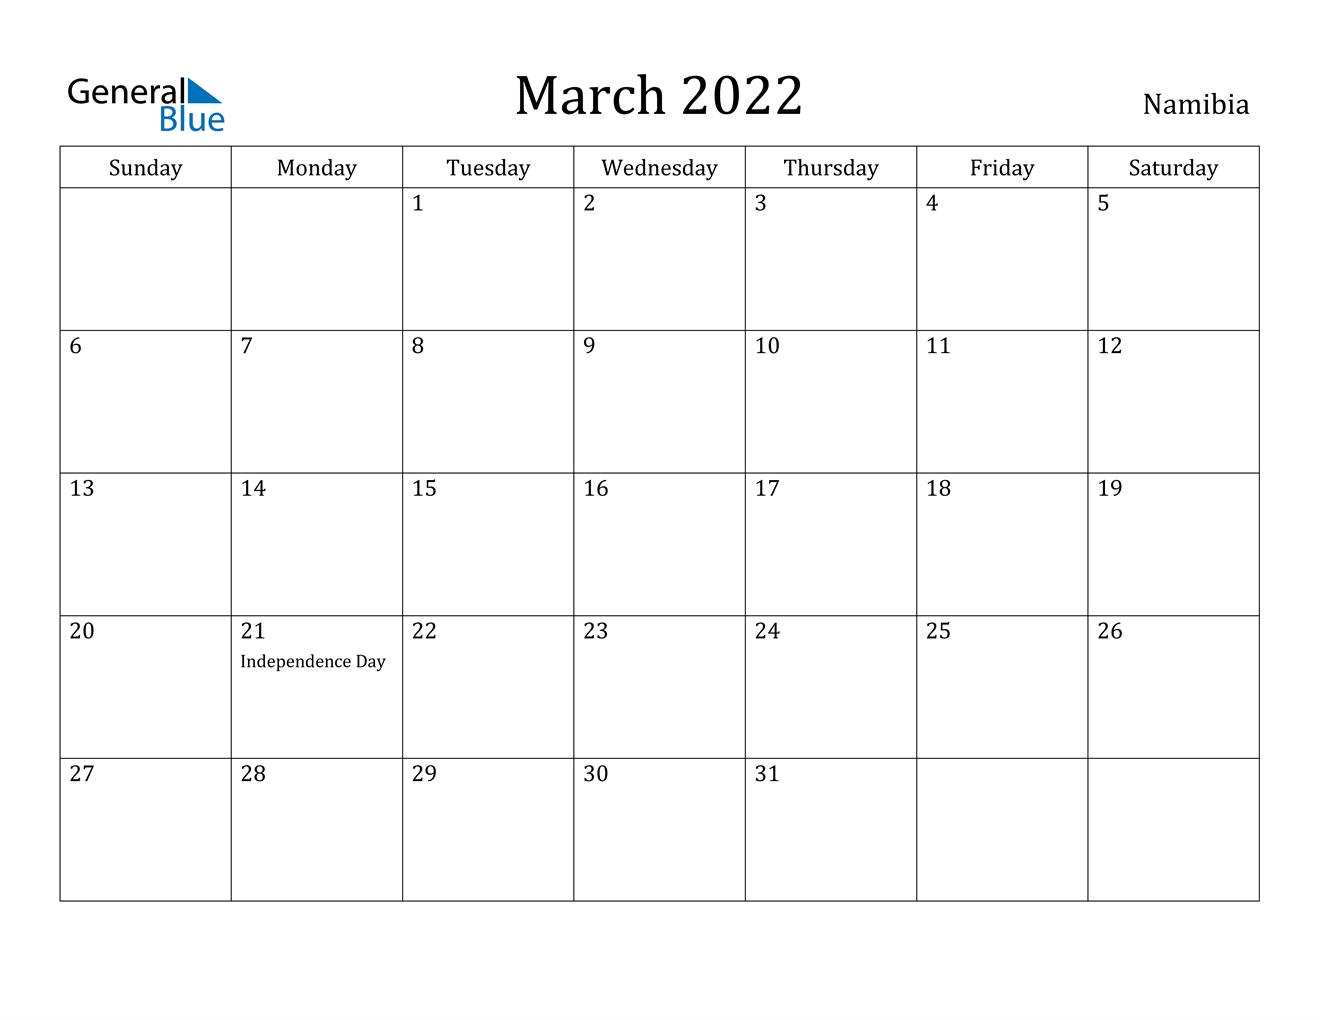 March 2022 Calendar - Namibia